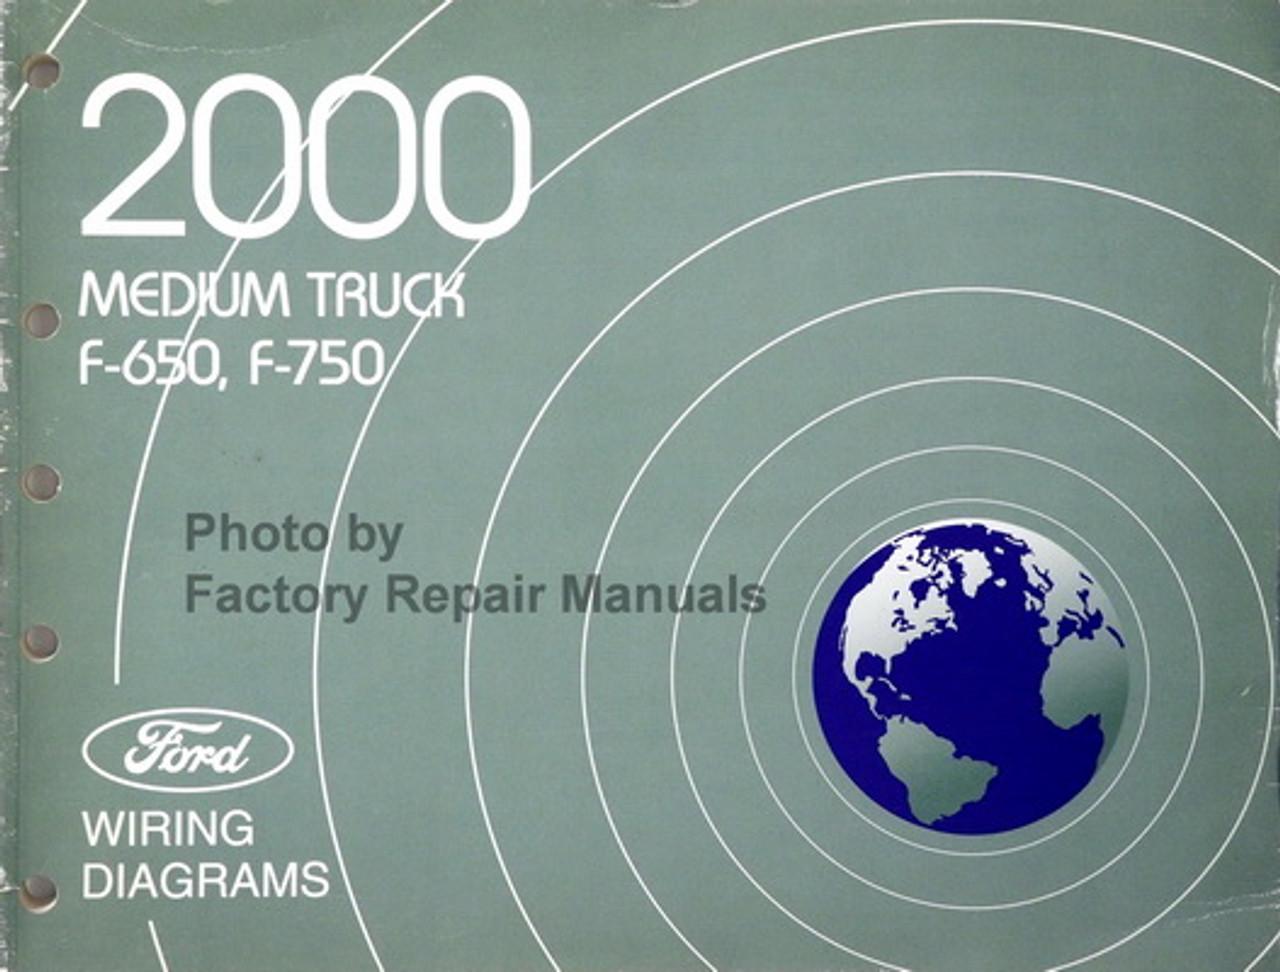 2000 Ford F650 F750 Medium Duty Truck Electrical Wiring Diagrams - Factory  Repair Manuals | Ford Medium Duty Truck Wiring Diagrams |  | Factory Repair Manuals